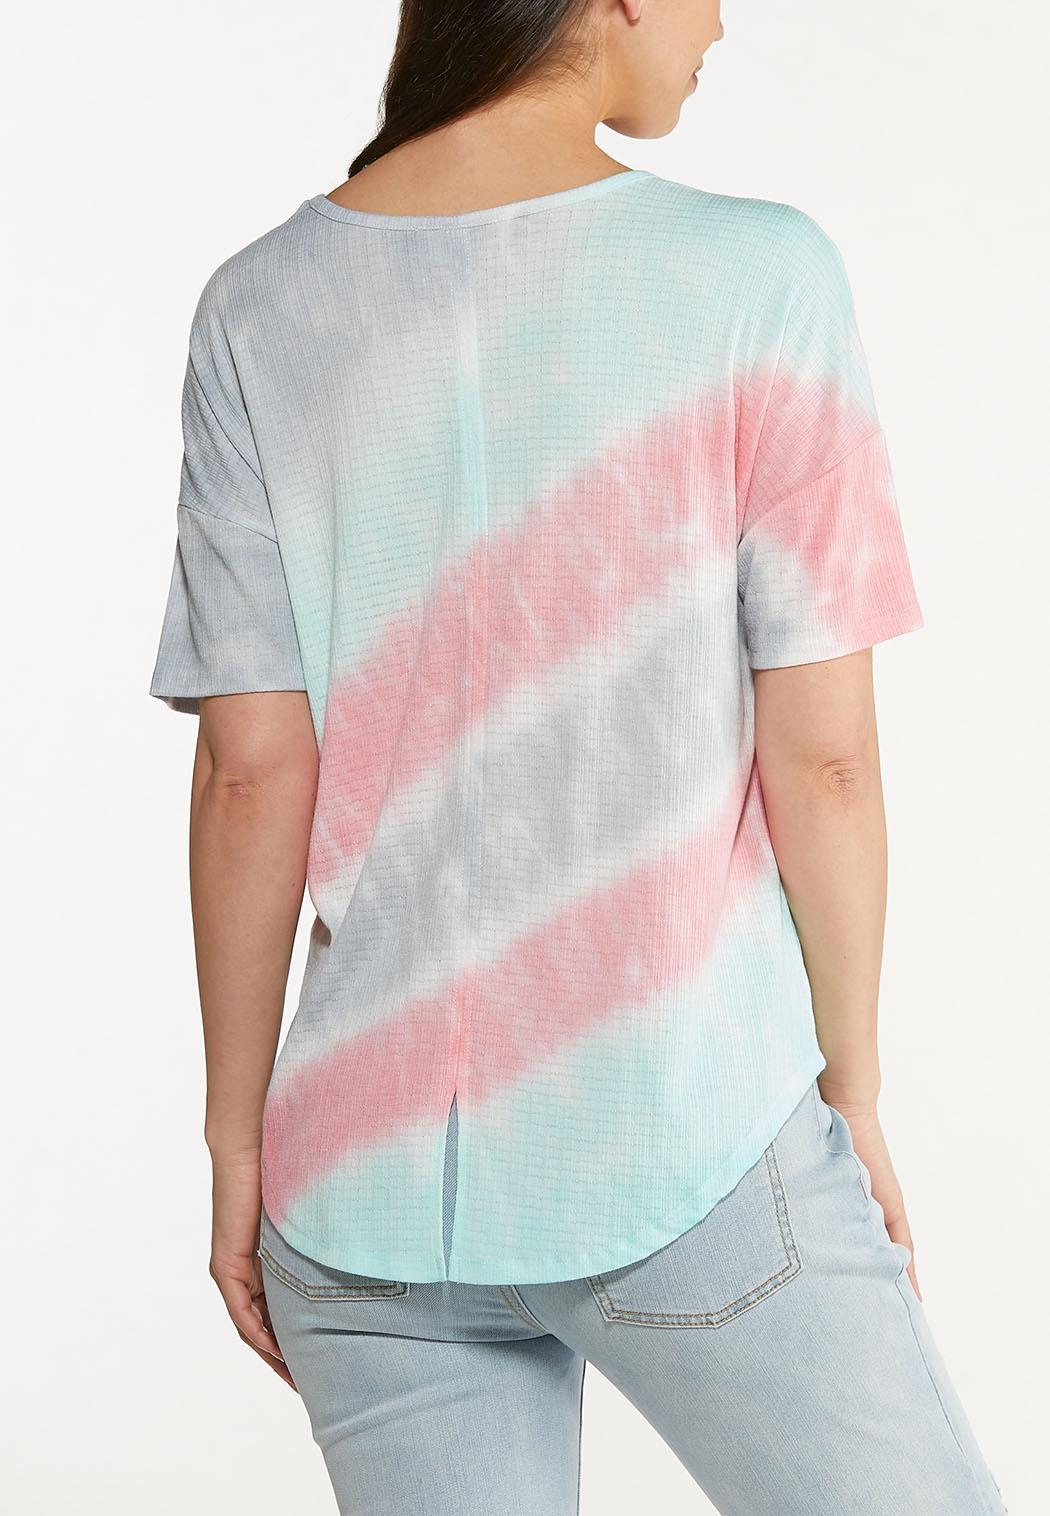 Plus Size Pastel Tie Dye Top (Item #44622671)